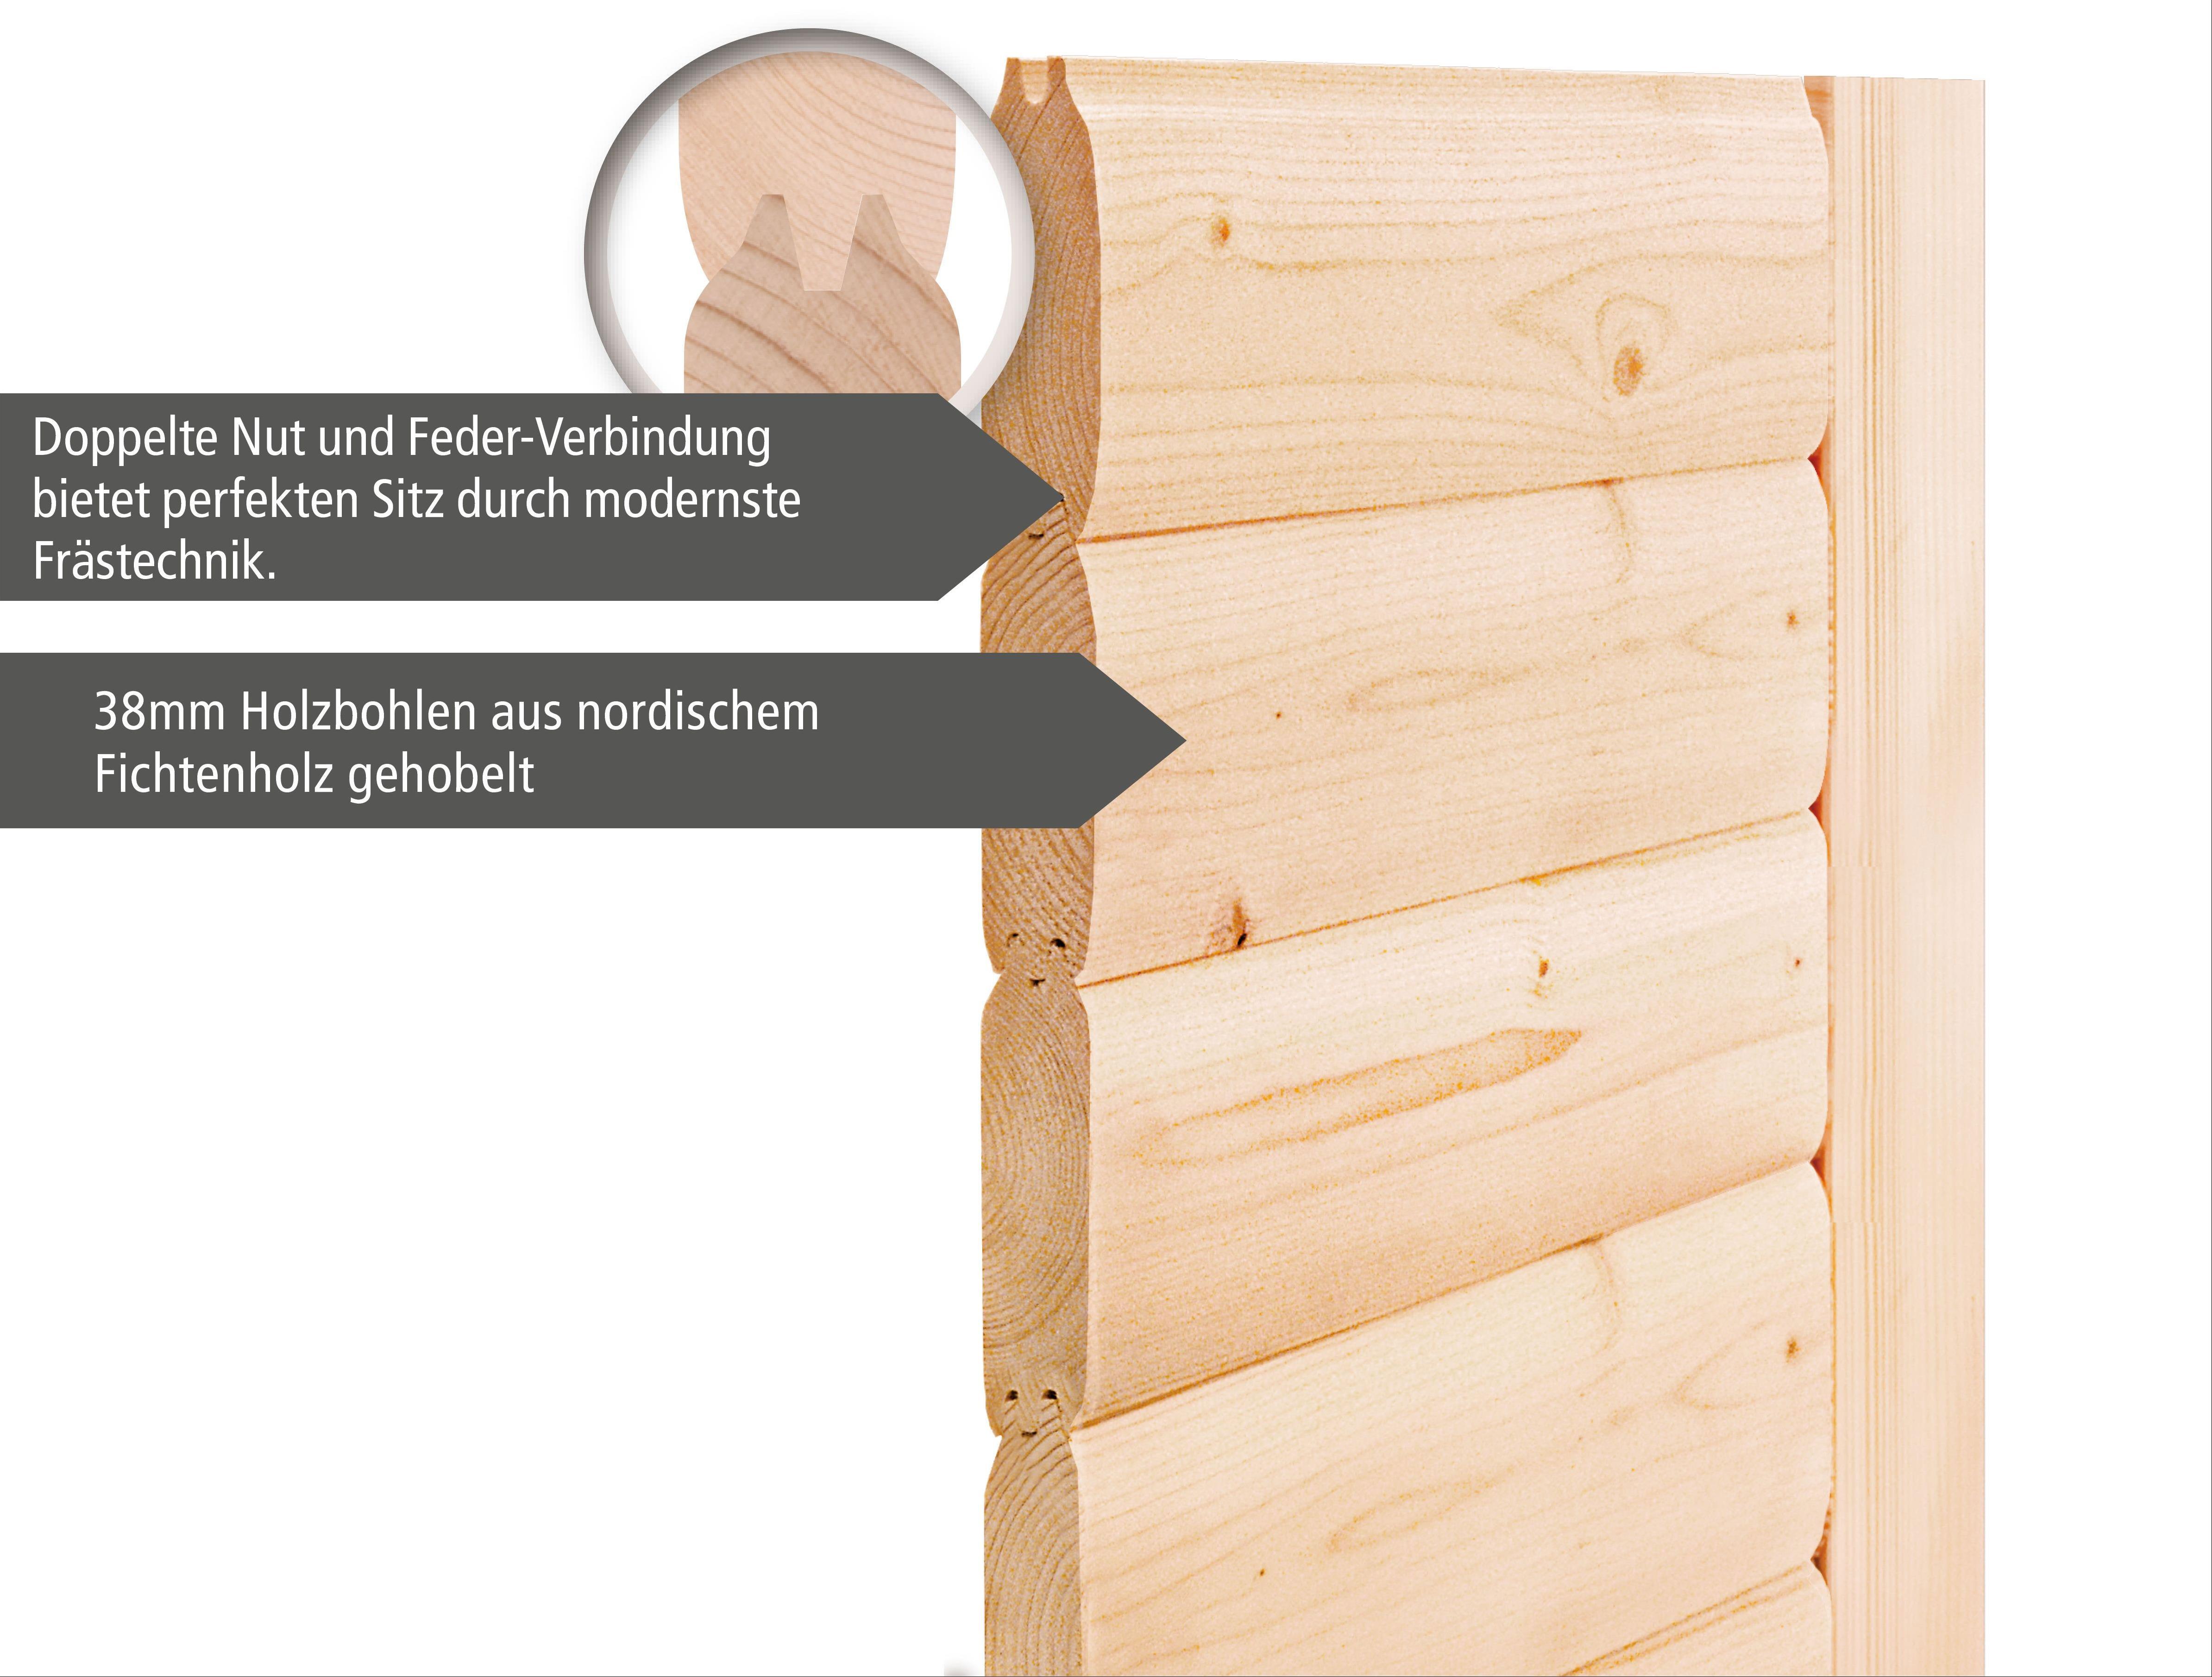 Woodfeeling Sauna Karla 38mm Kranz Ofen 9kW extern Tür modern Bild 5